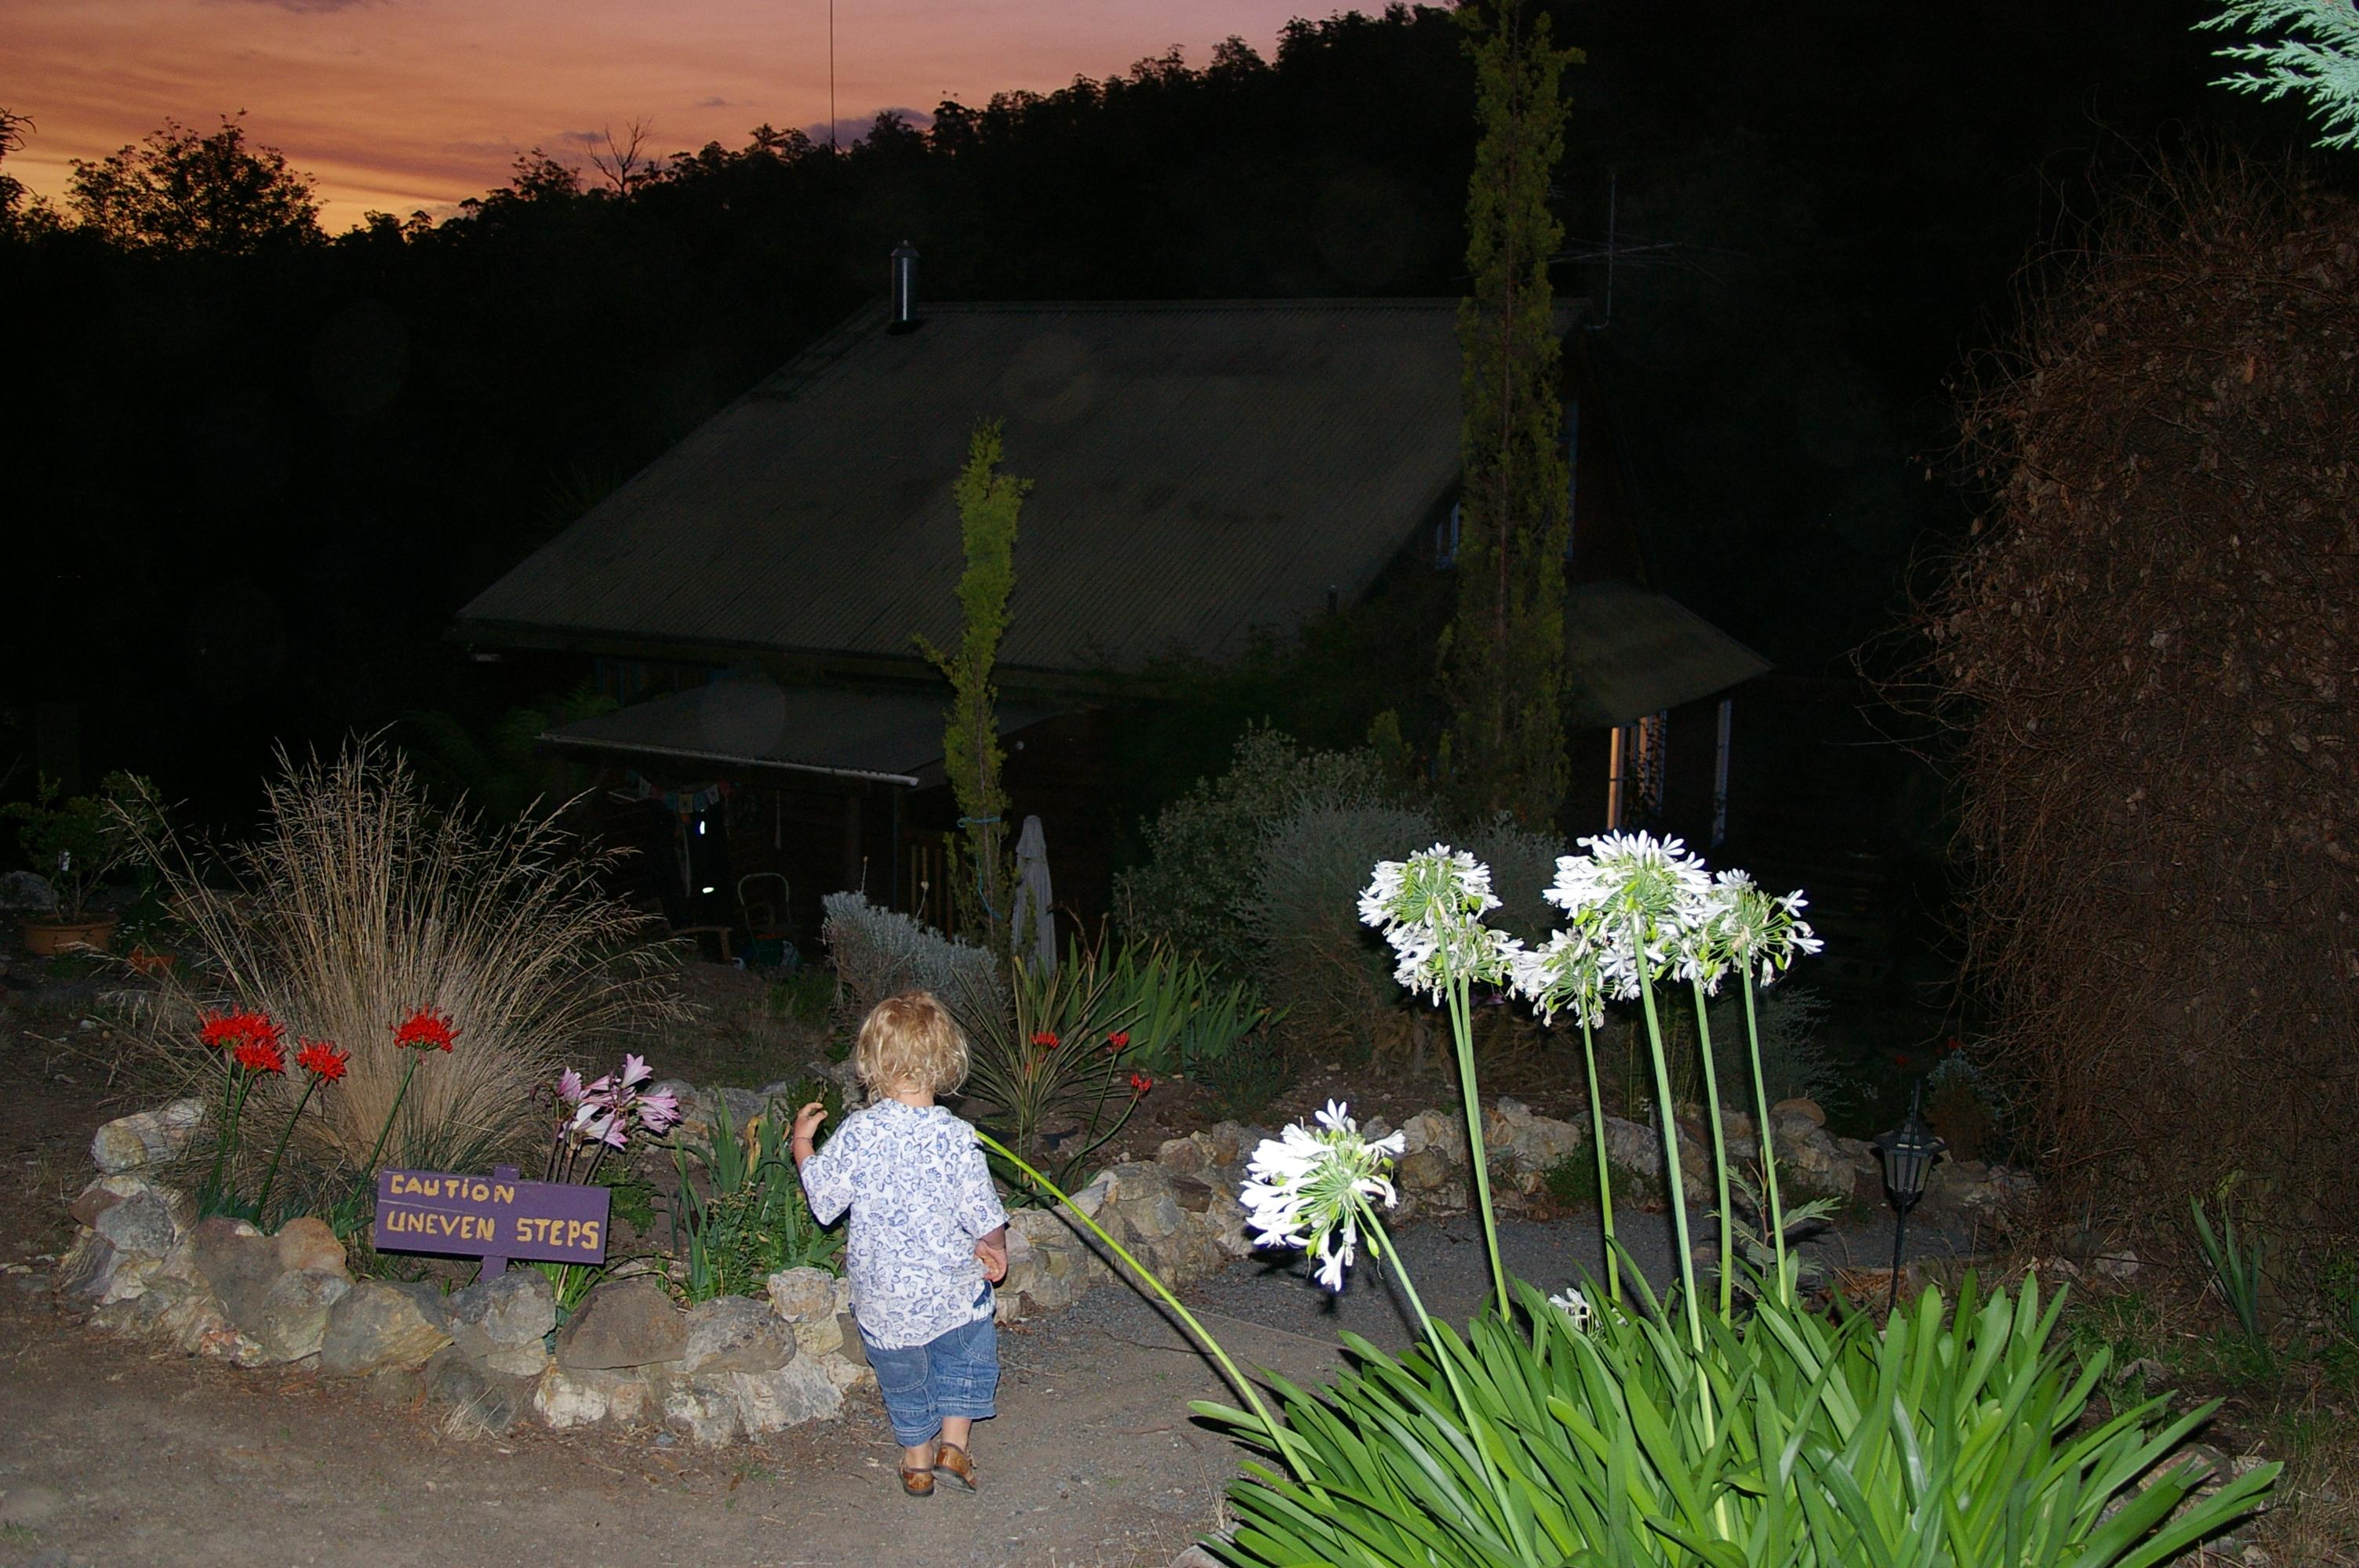 My grandson on an evening adventure!